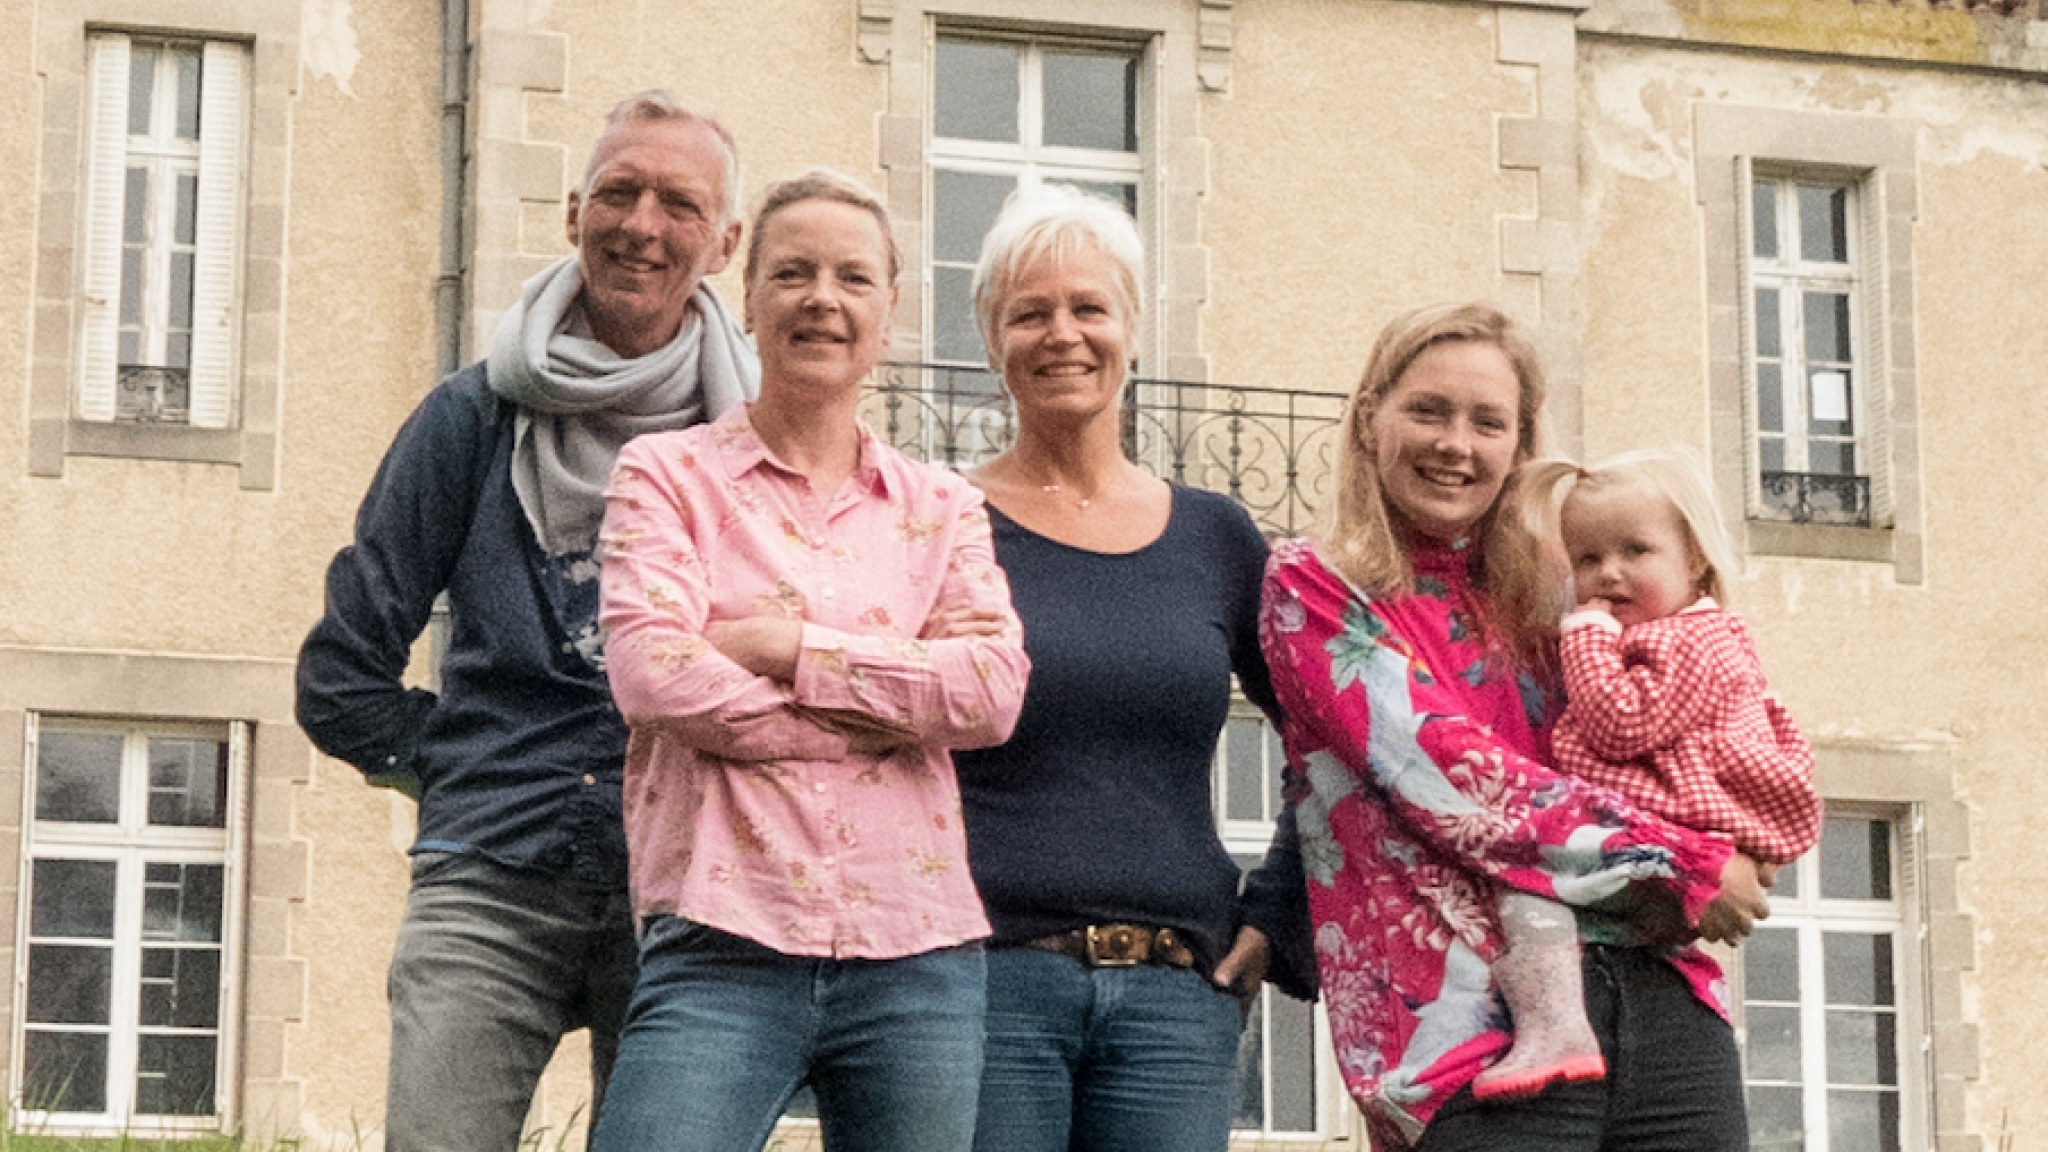 Chateau Meiland Breekt In Tweeën: Caroline Terug In